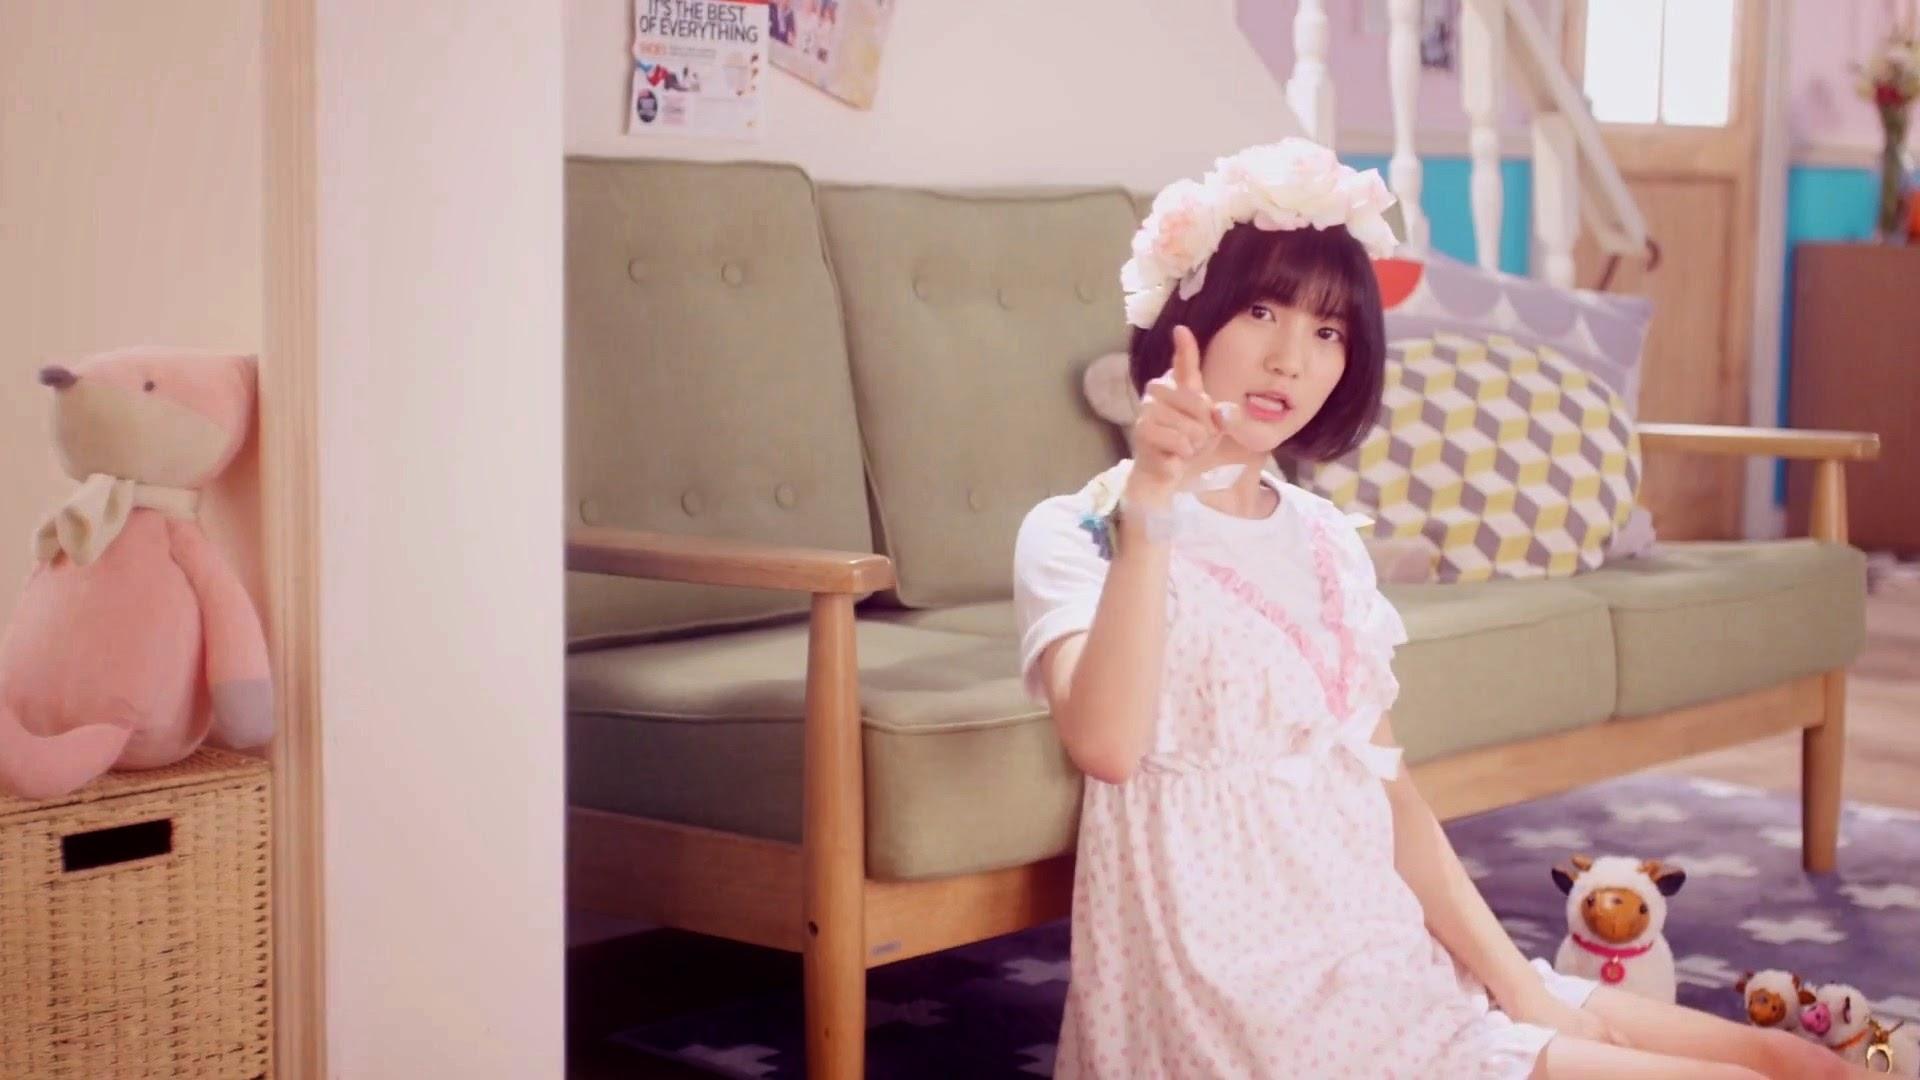 Oh My Girl's Binnie in Cupid MV